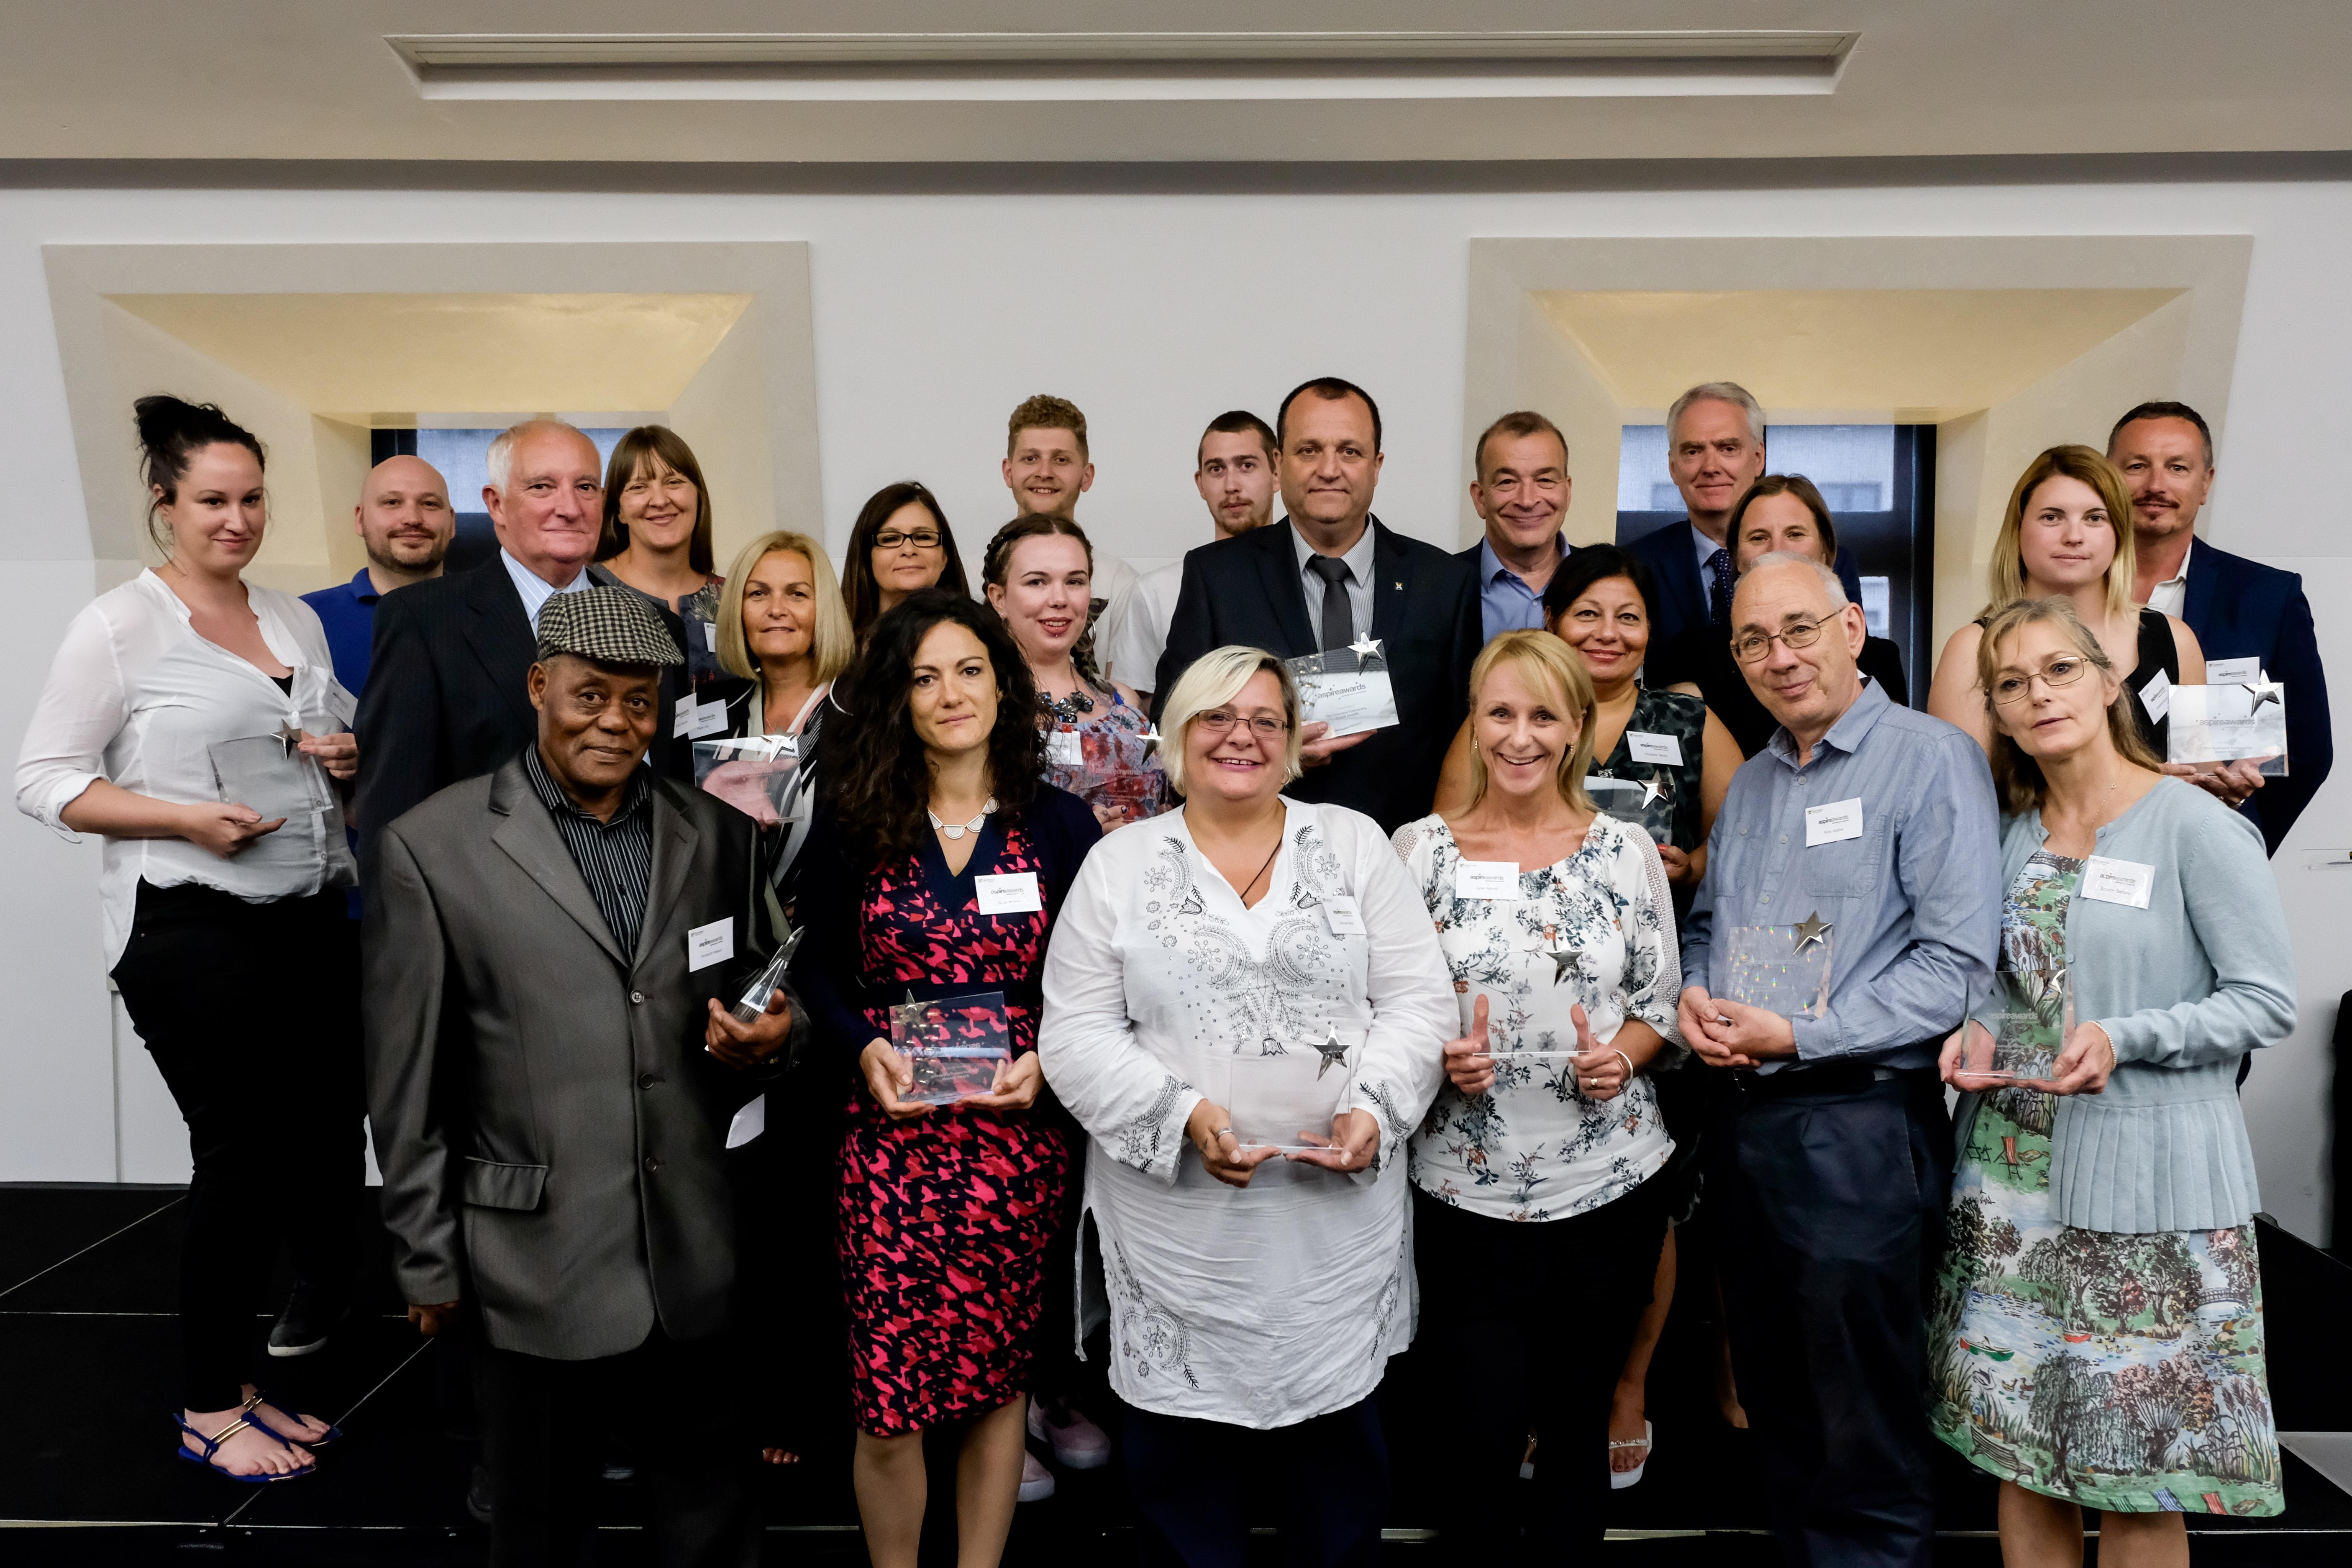 Aspire Award 2017 winners